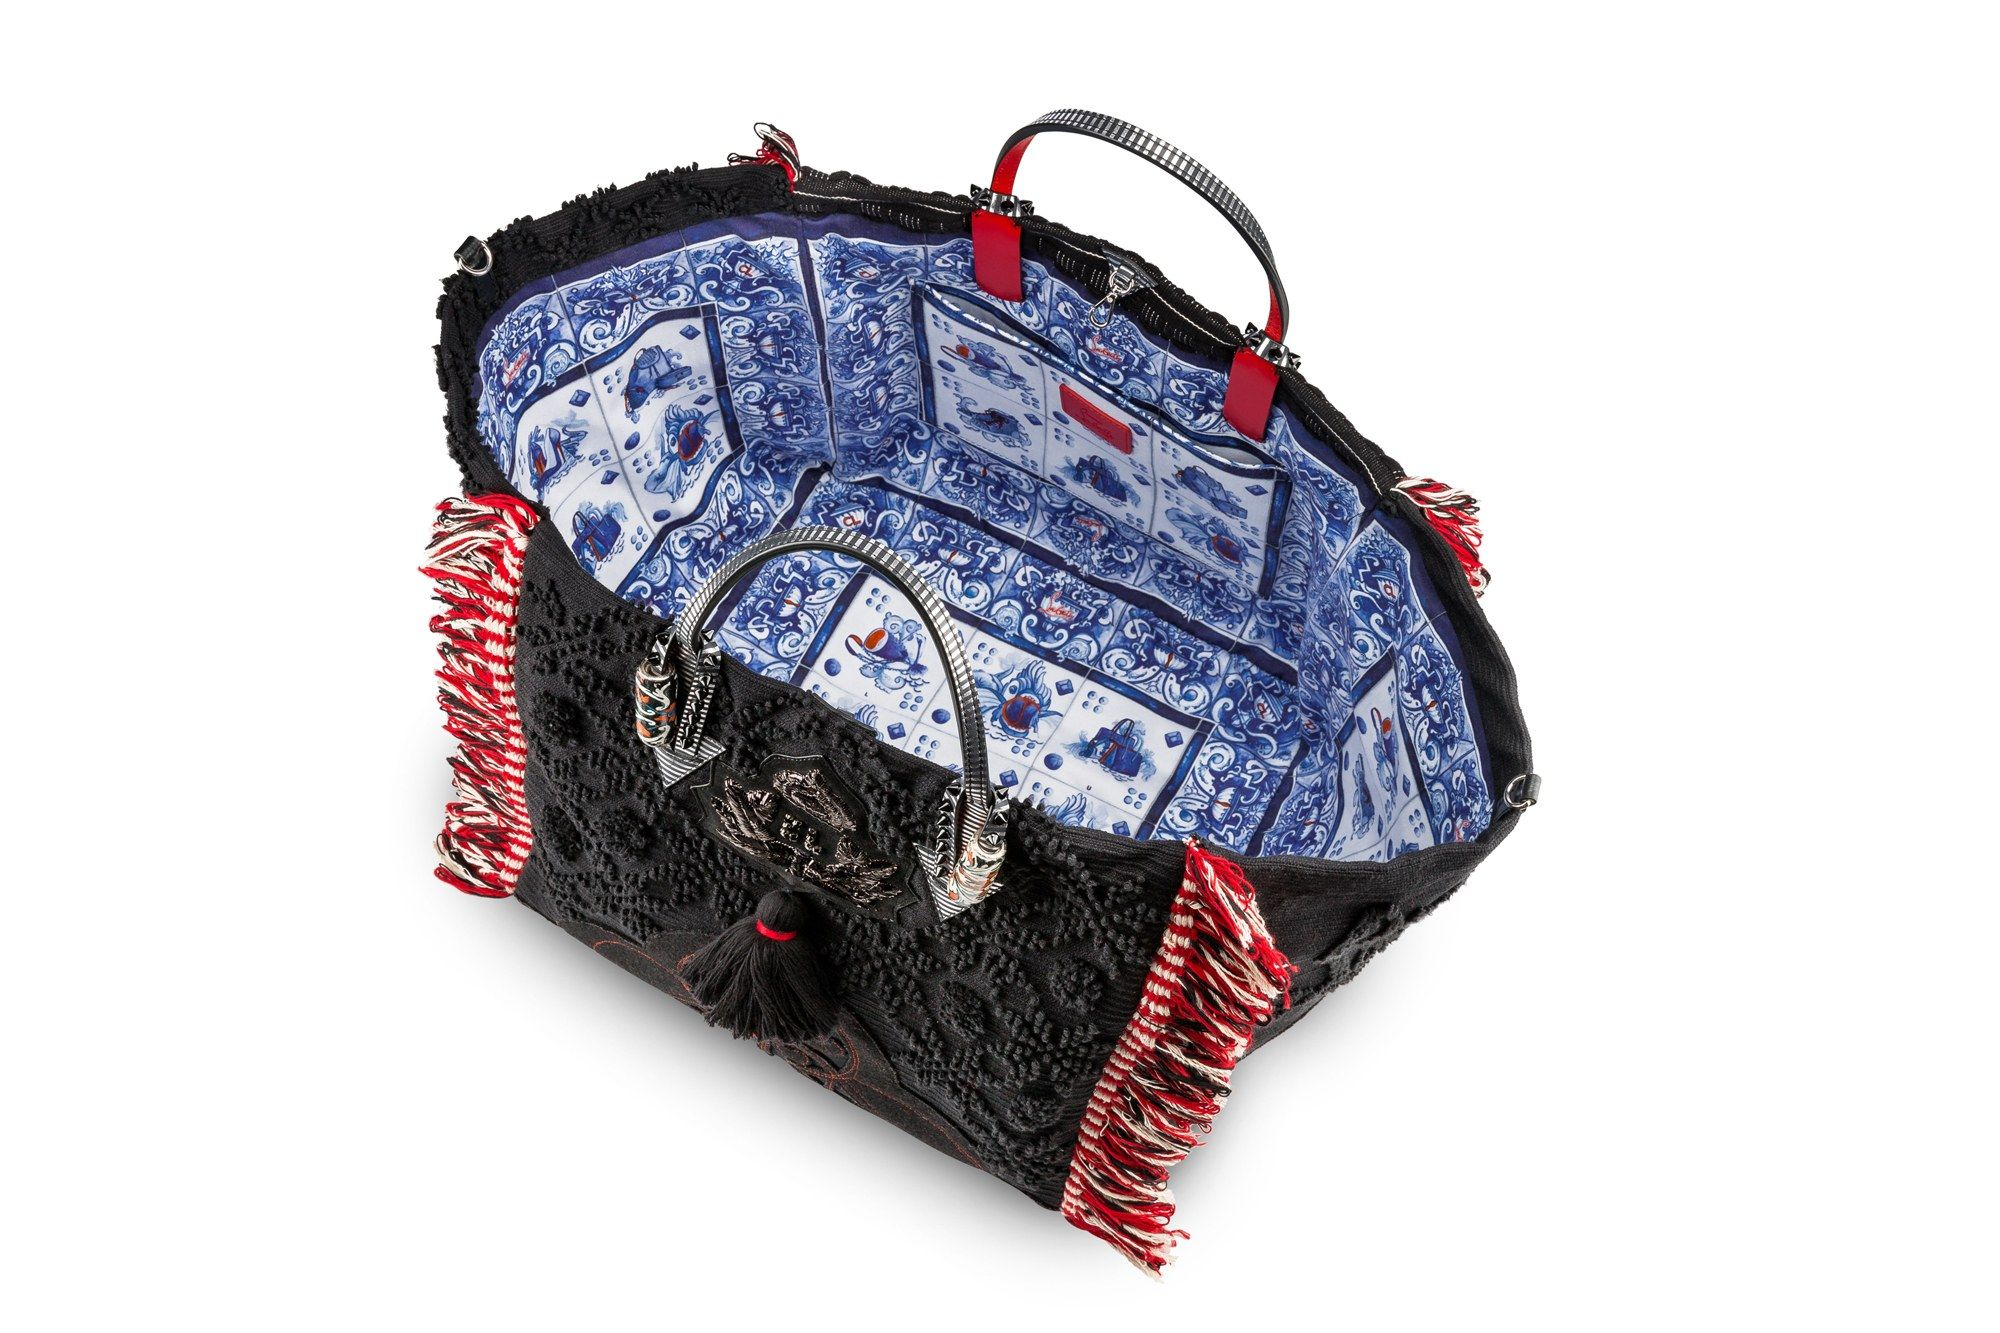 86b1a79660c Christian Louboutin presenta la borsa charity Portugaba #Comment #en ...